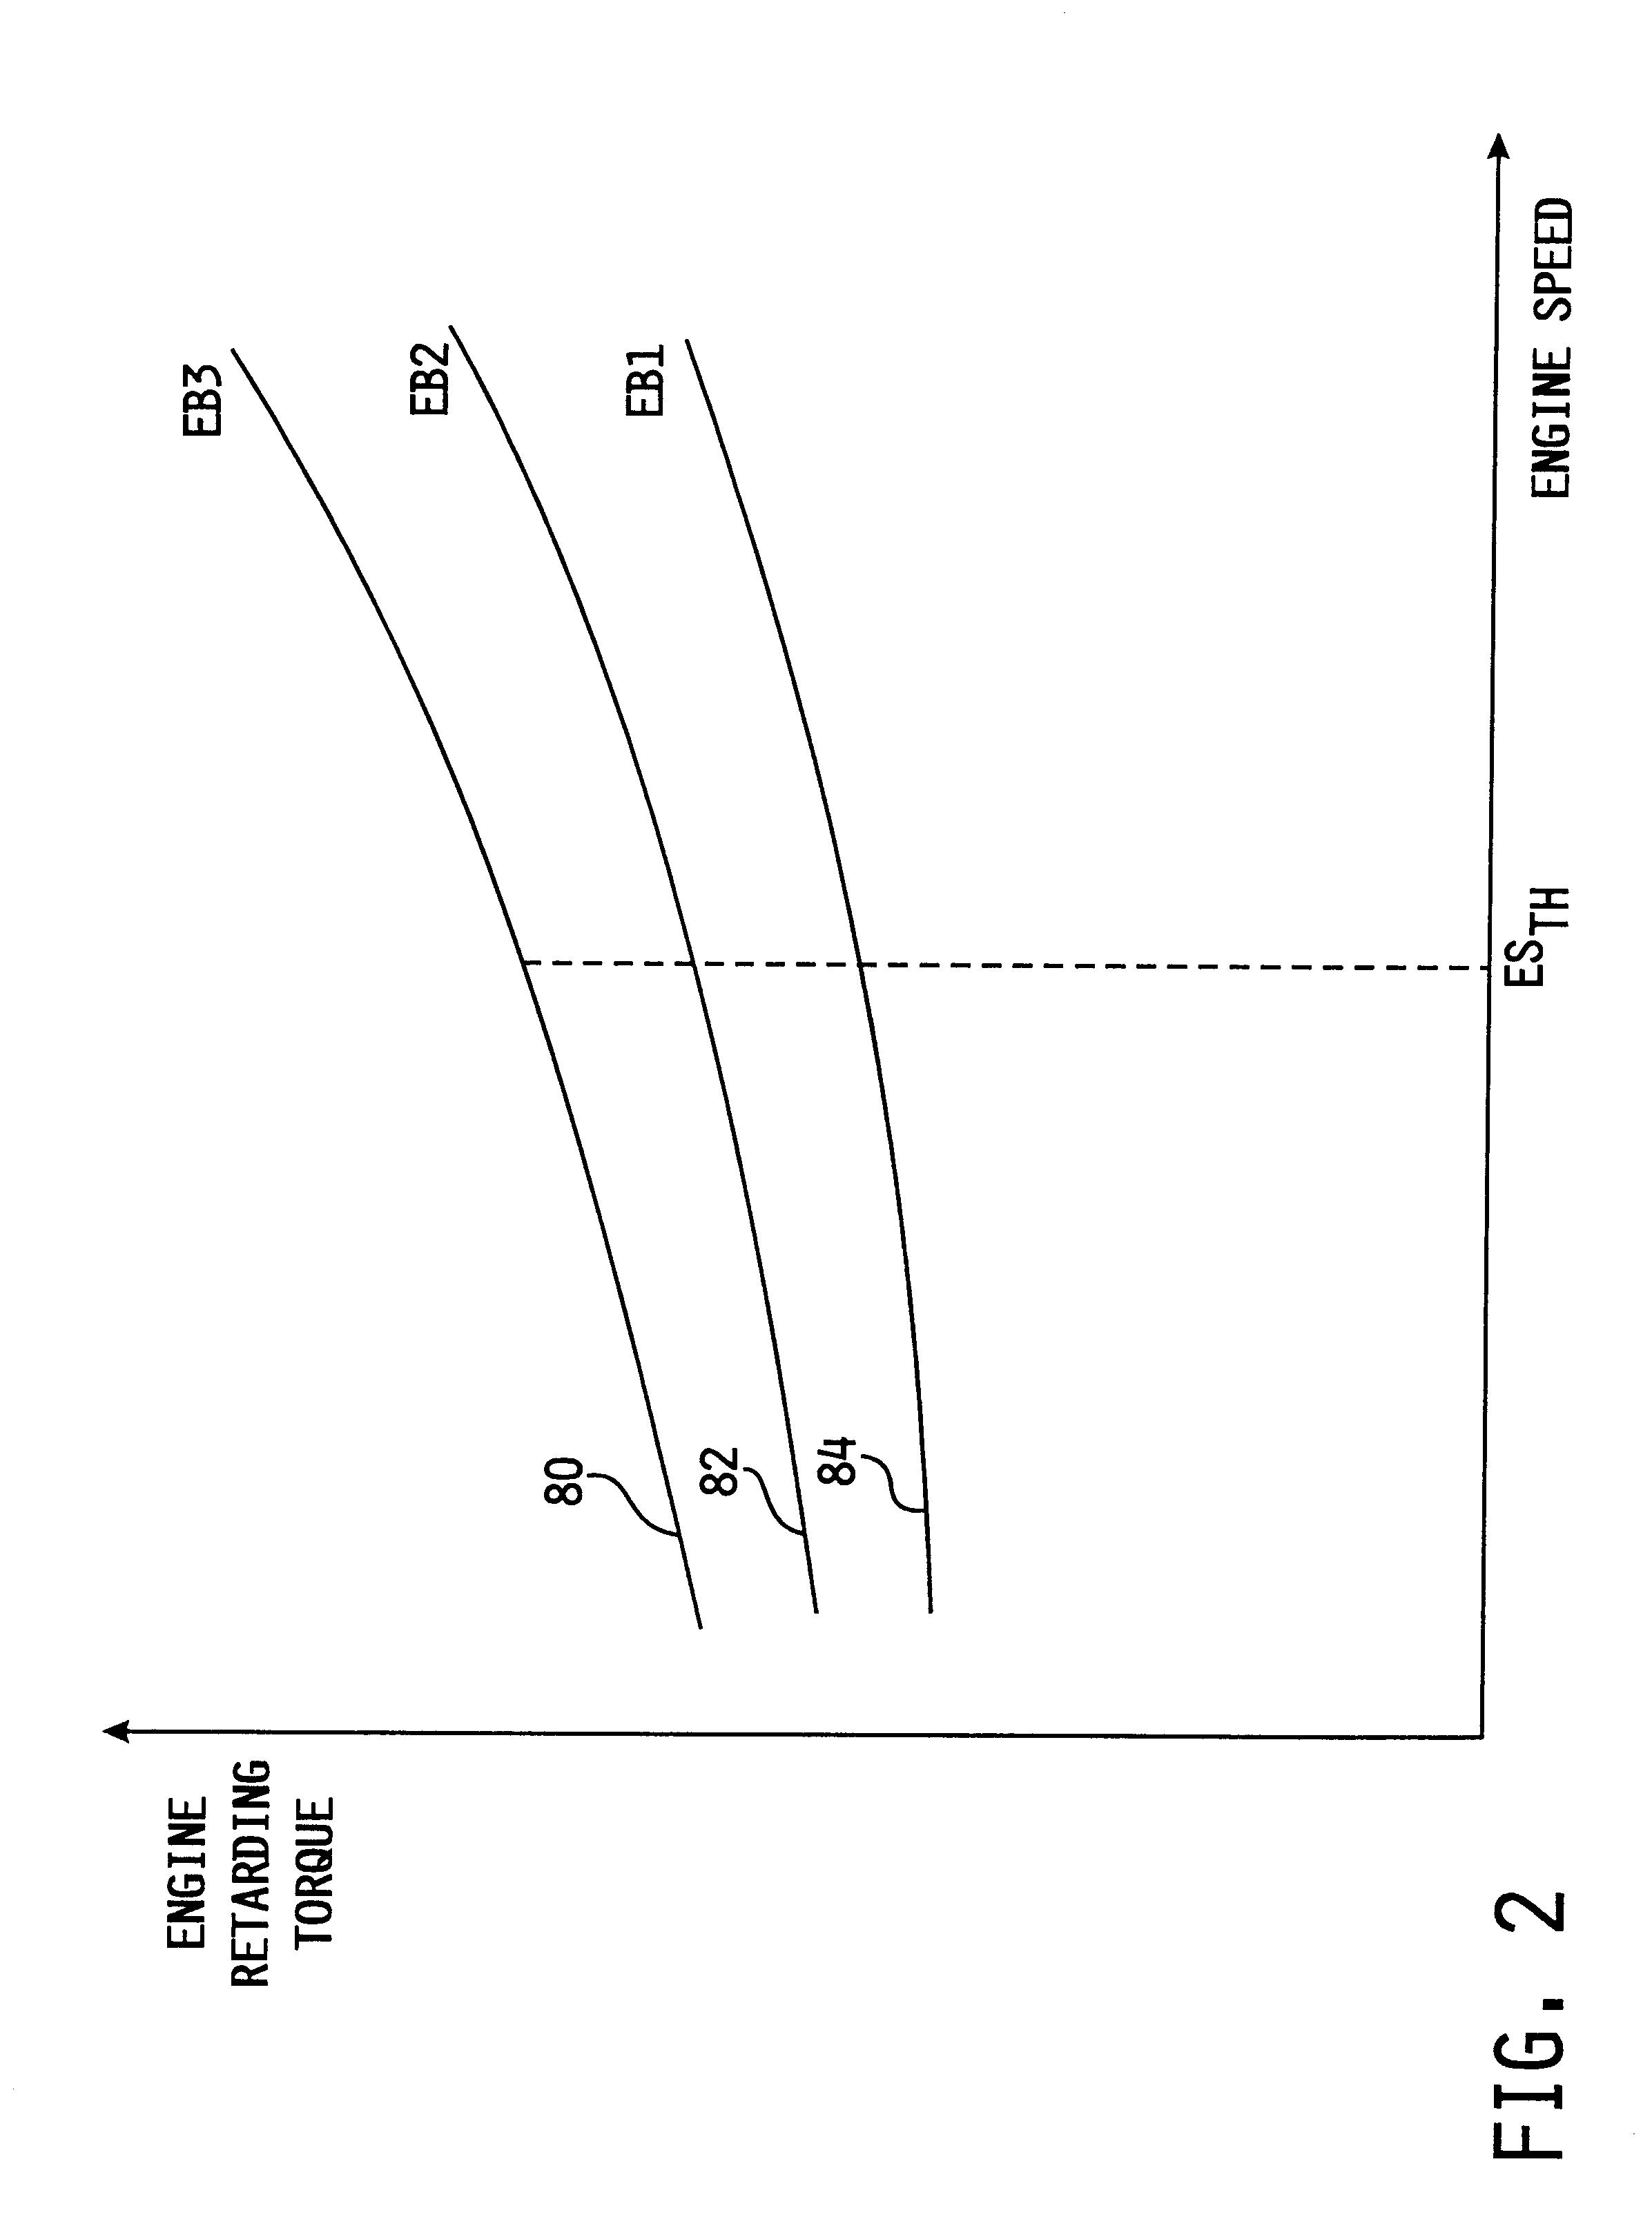 Patent US 6,349,253 B1